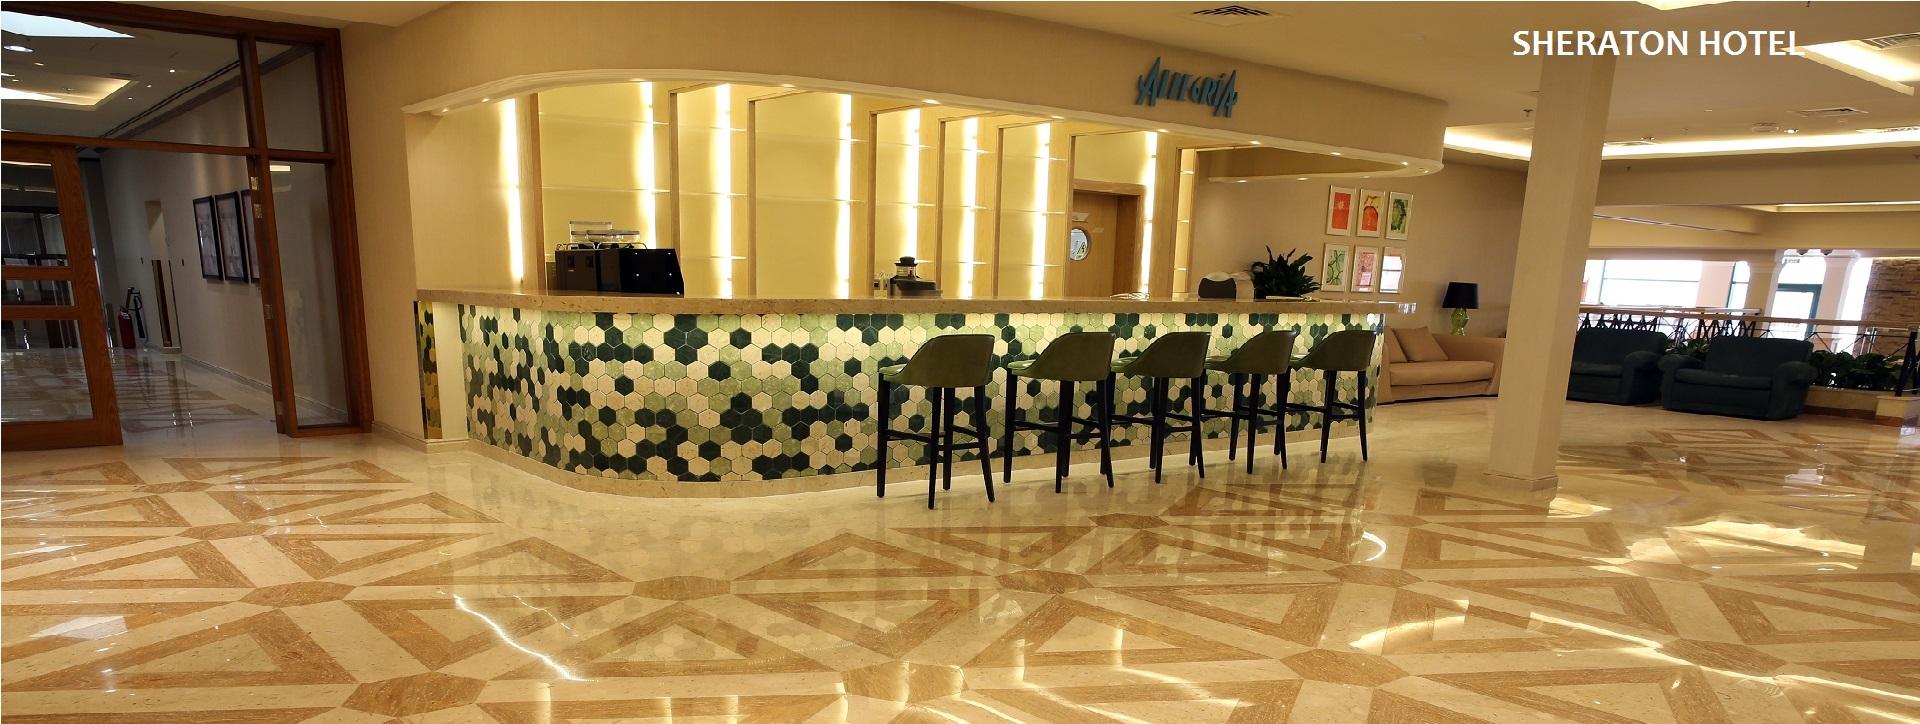 SHERATON HOTEL 1